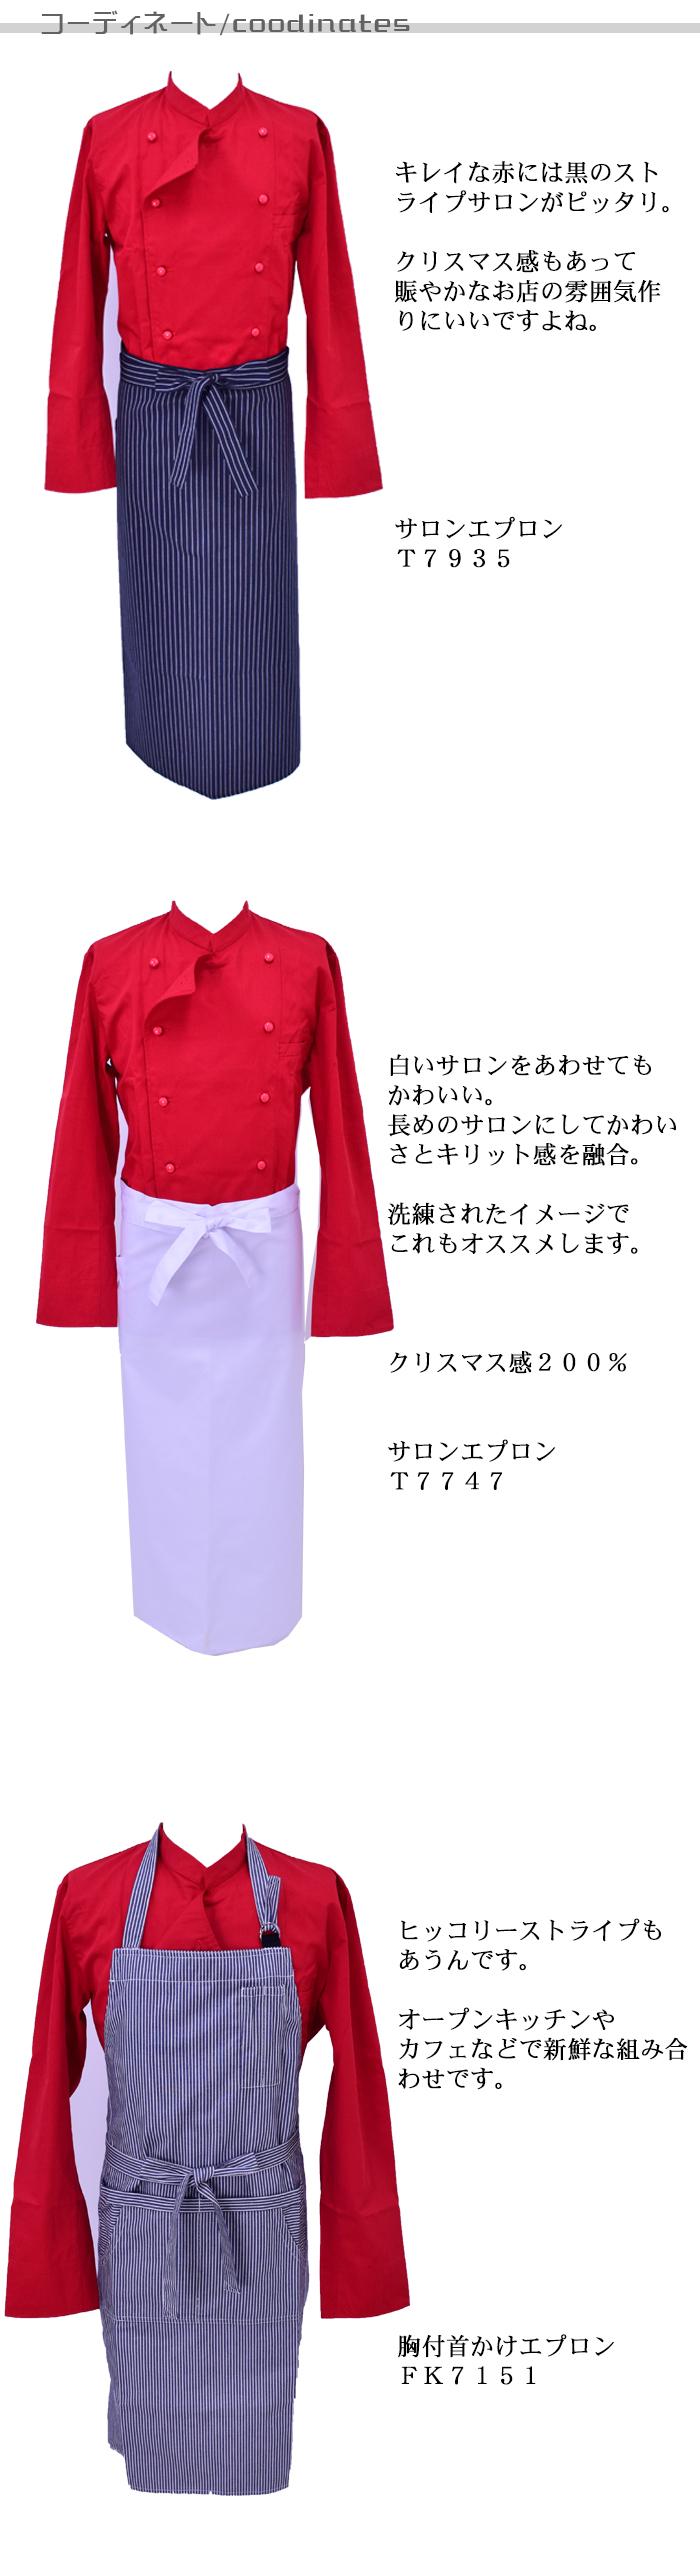 BA1220-2赤いコックコート着用例コーディネート